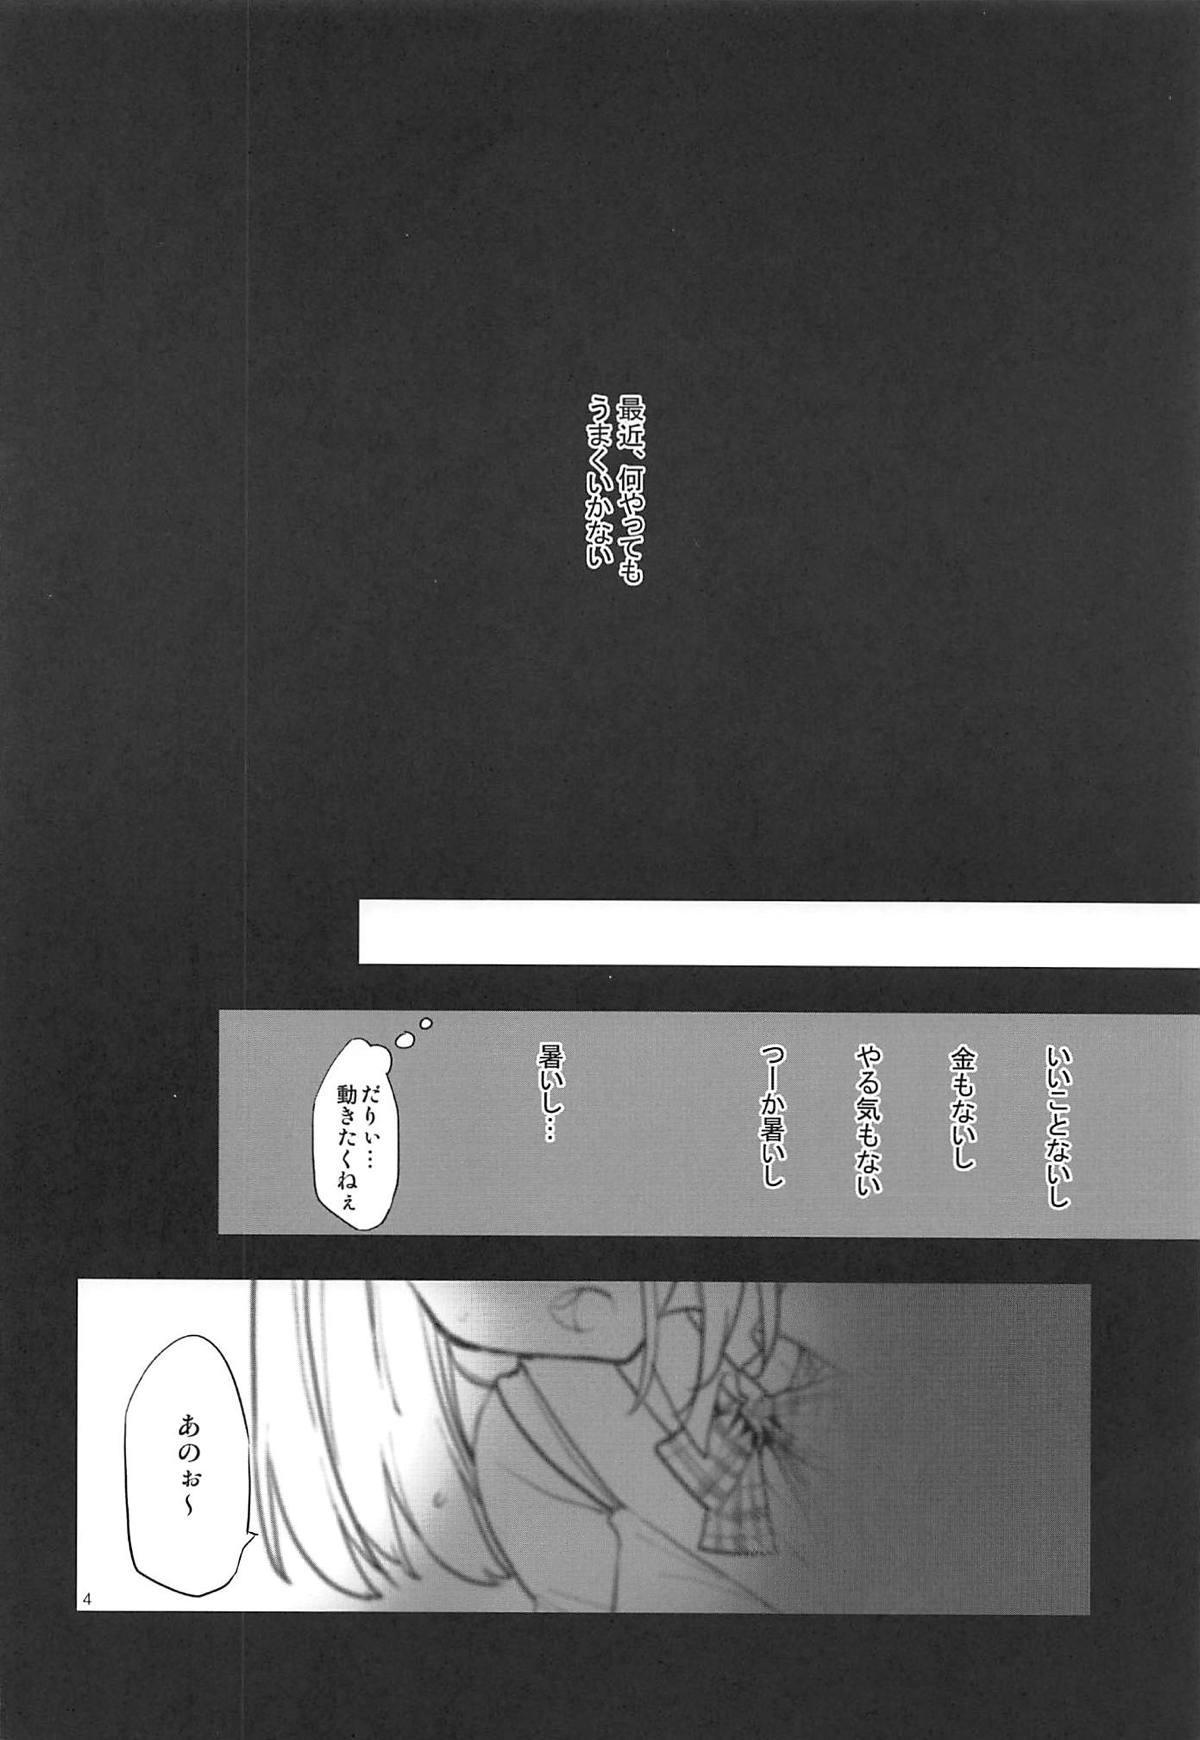 Yotsuba, Pants o Kai ni Iku 2